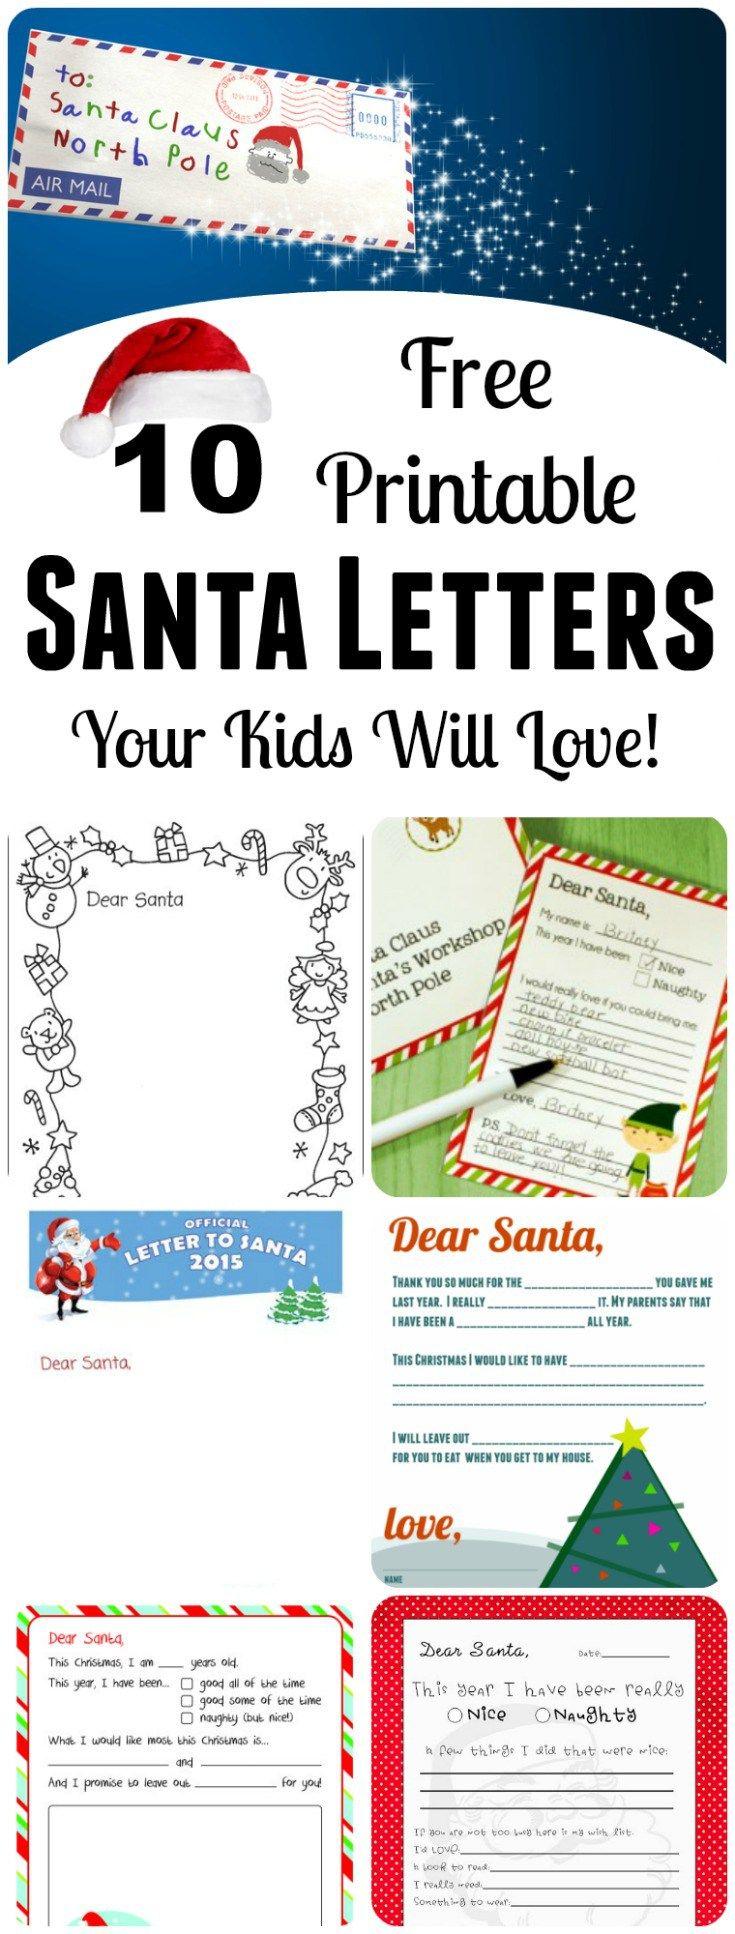 Santa Letters  Free Printable Letters To Santa  Santa Letter